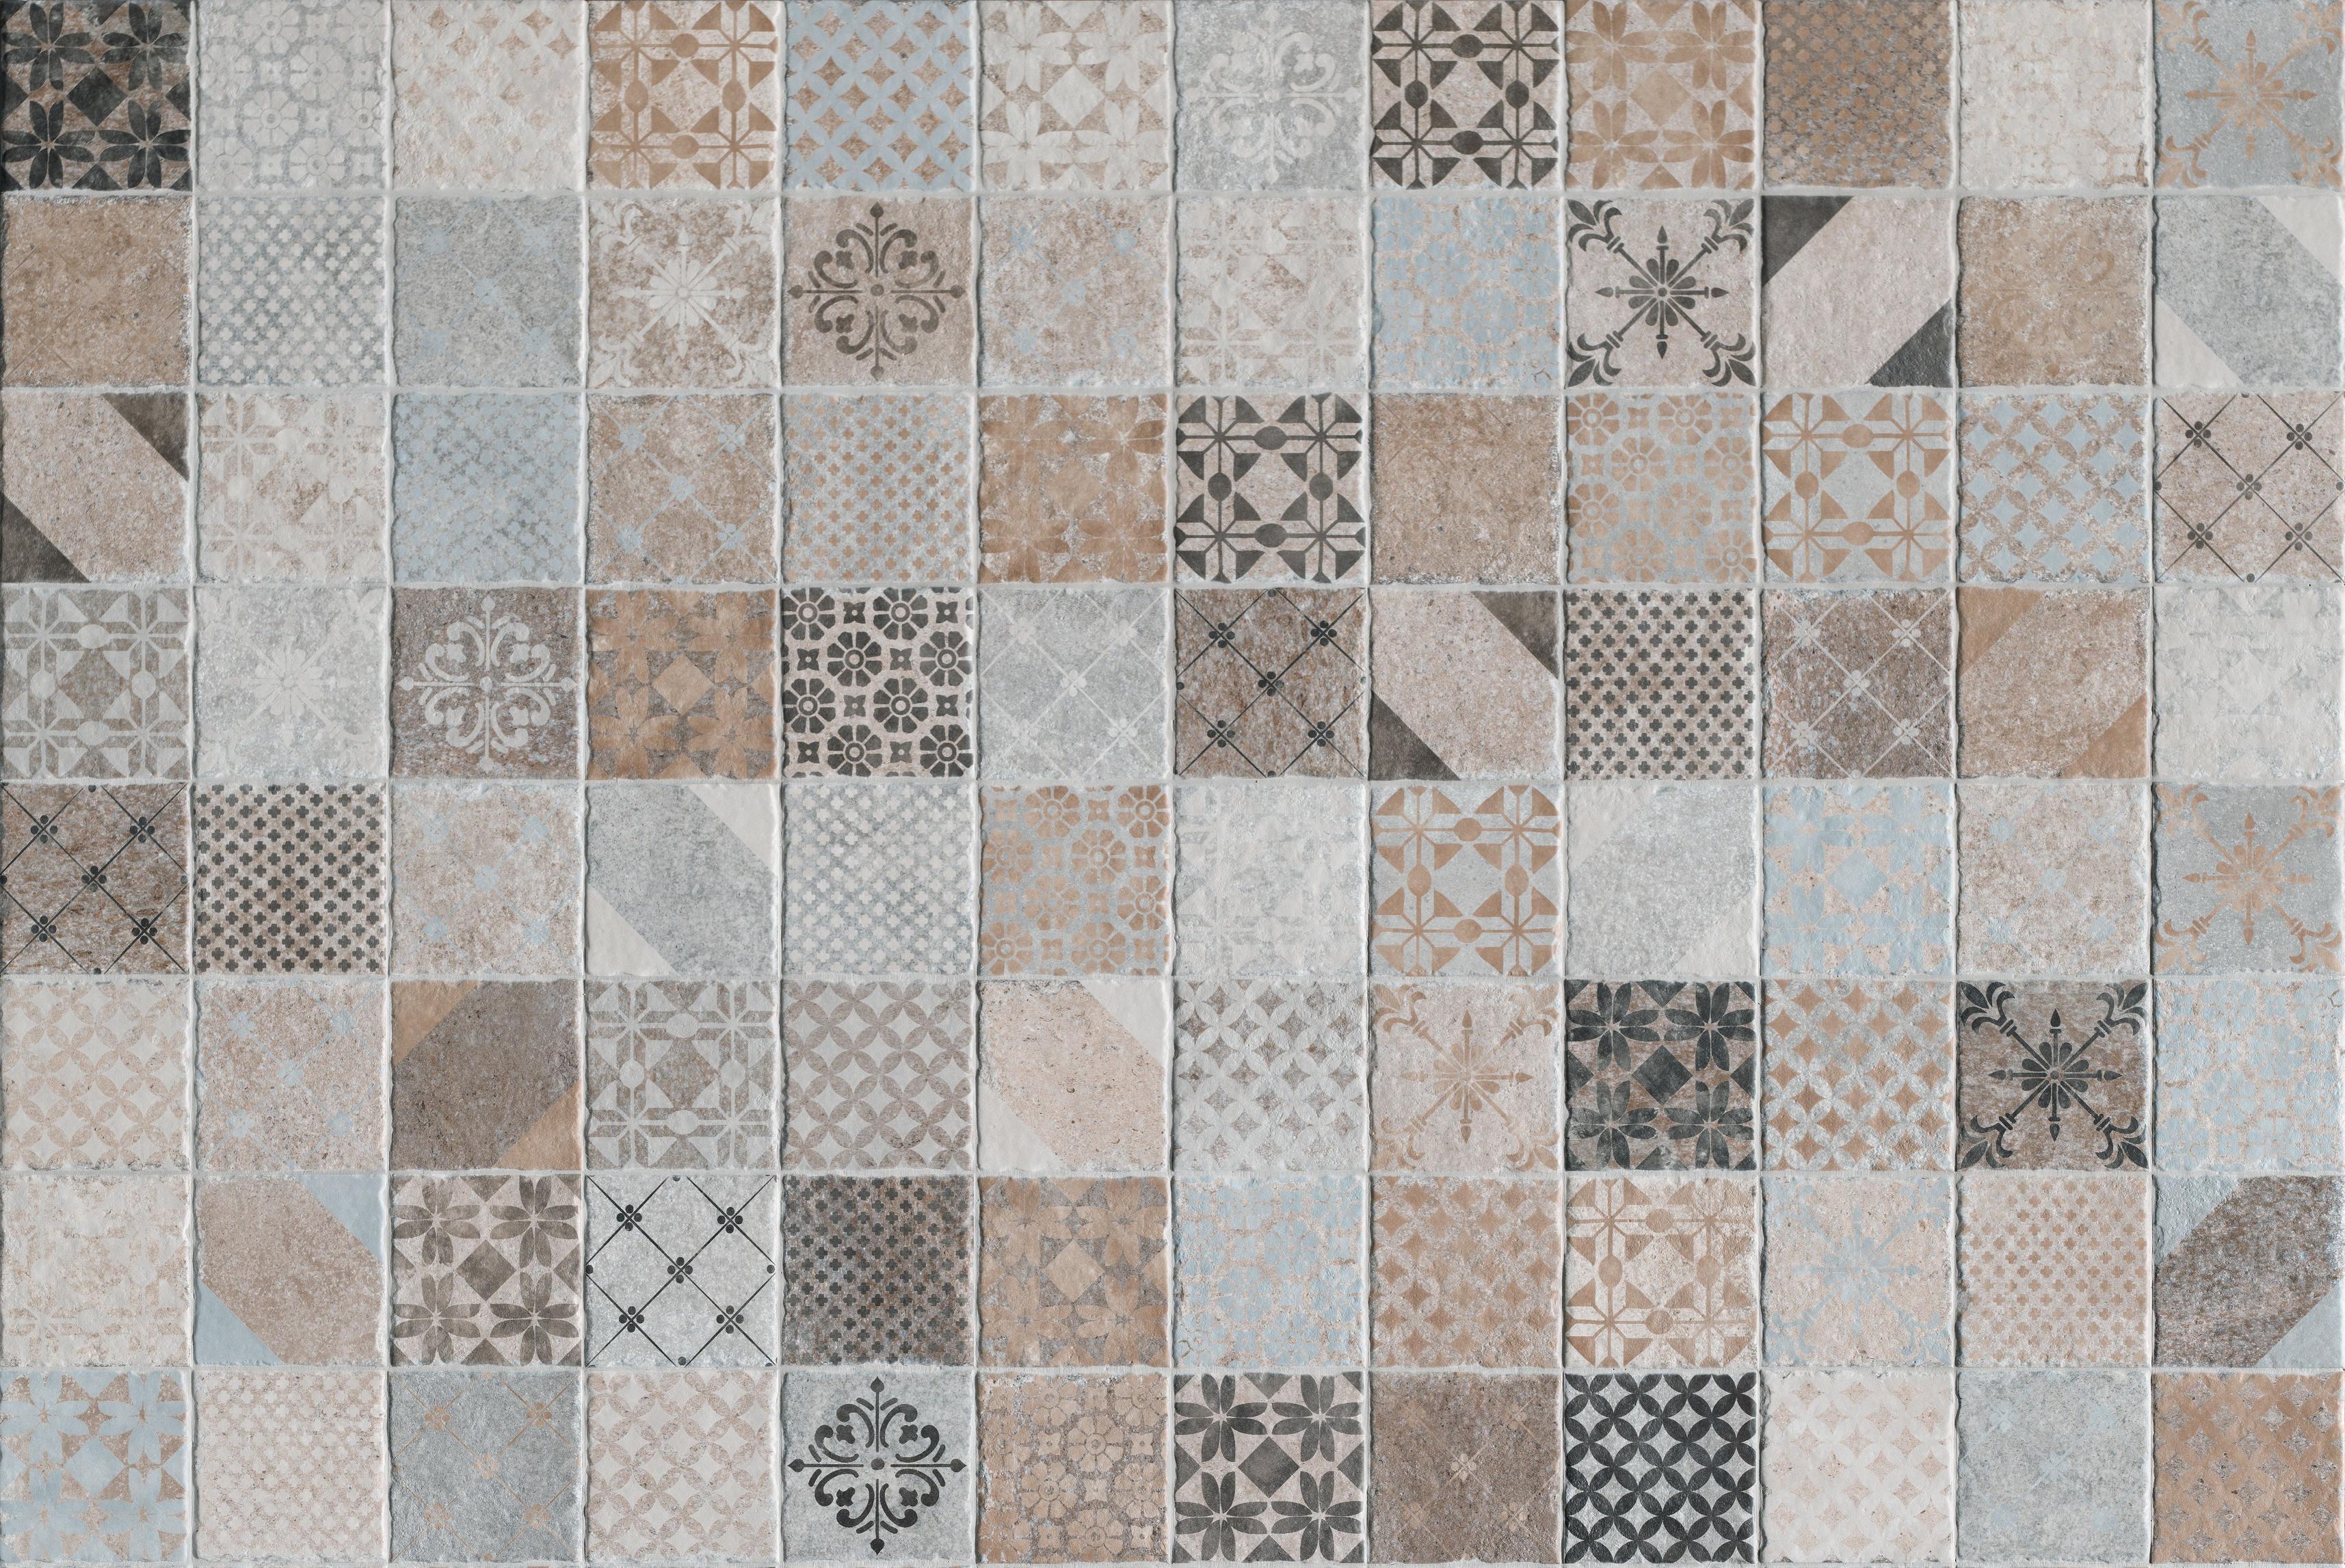 Carrelage Mosaique Castorama Frais Stock Carreaux De Ciment Castorama